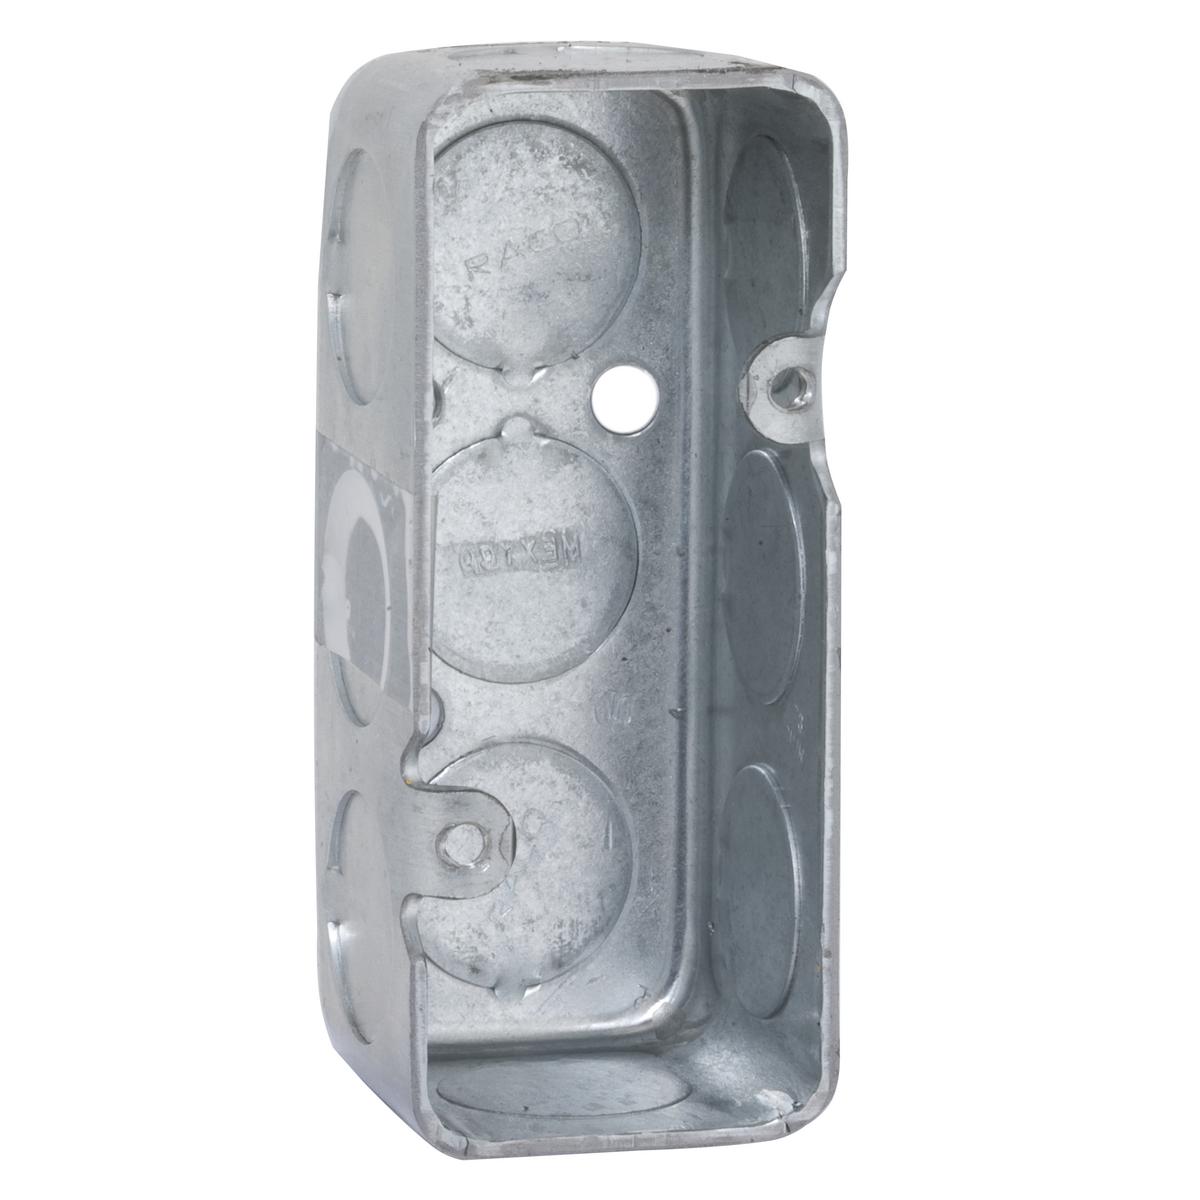 Hubbell-Raco 640 Handy Box